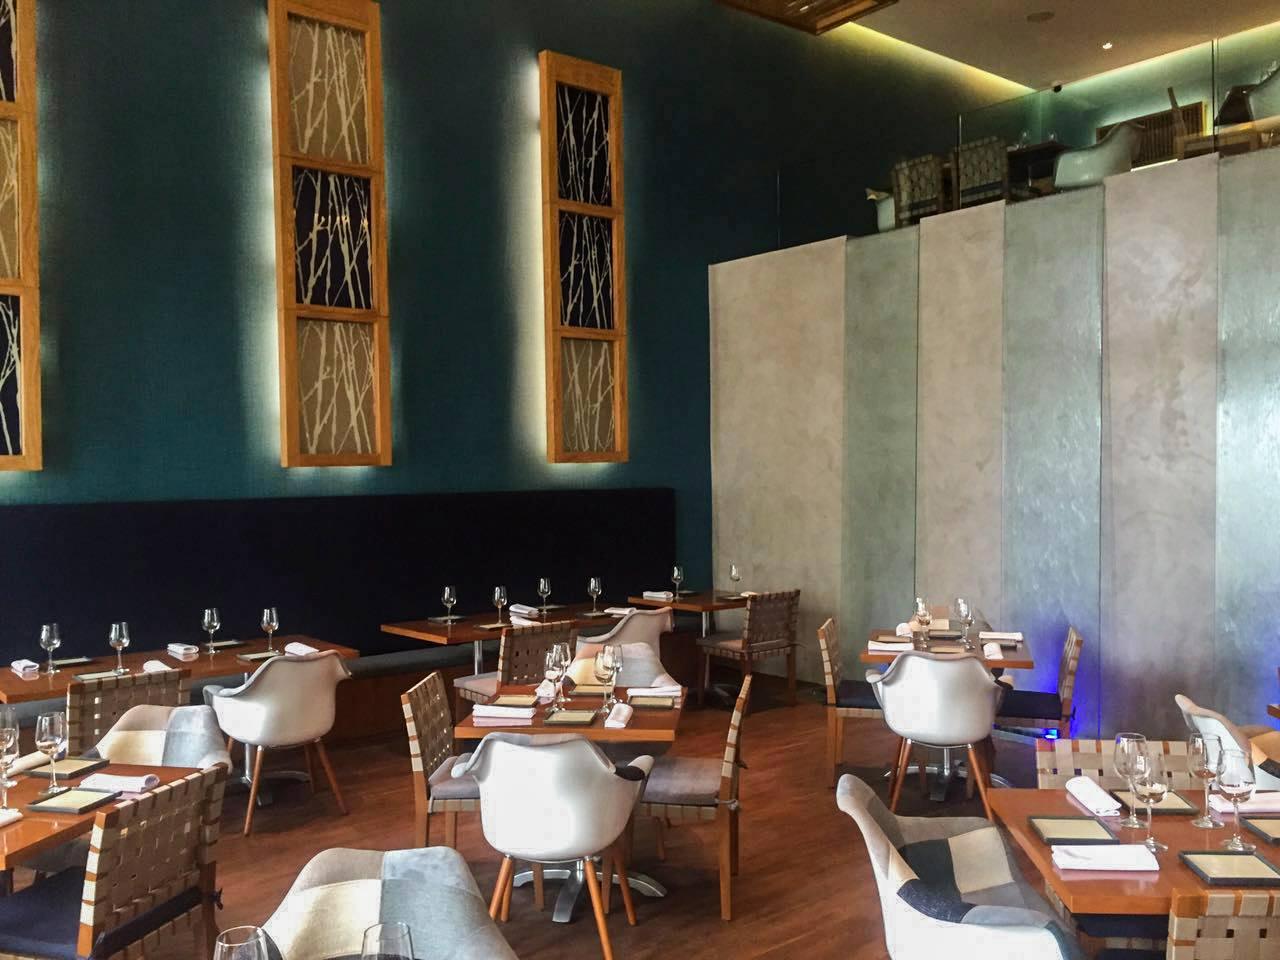 Embarcadero 41 restaurant in Guayaquil Peruvian cuisine